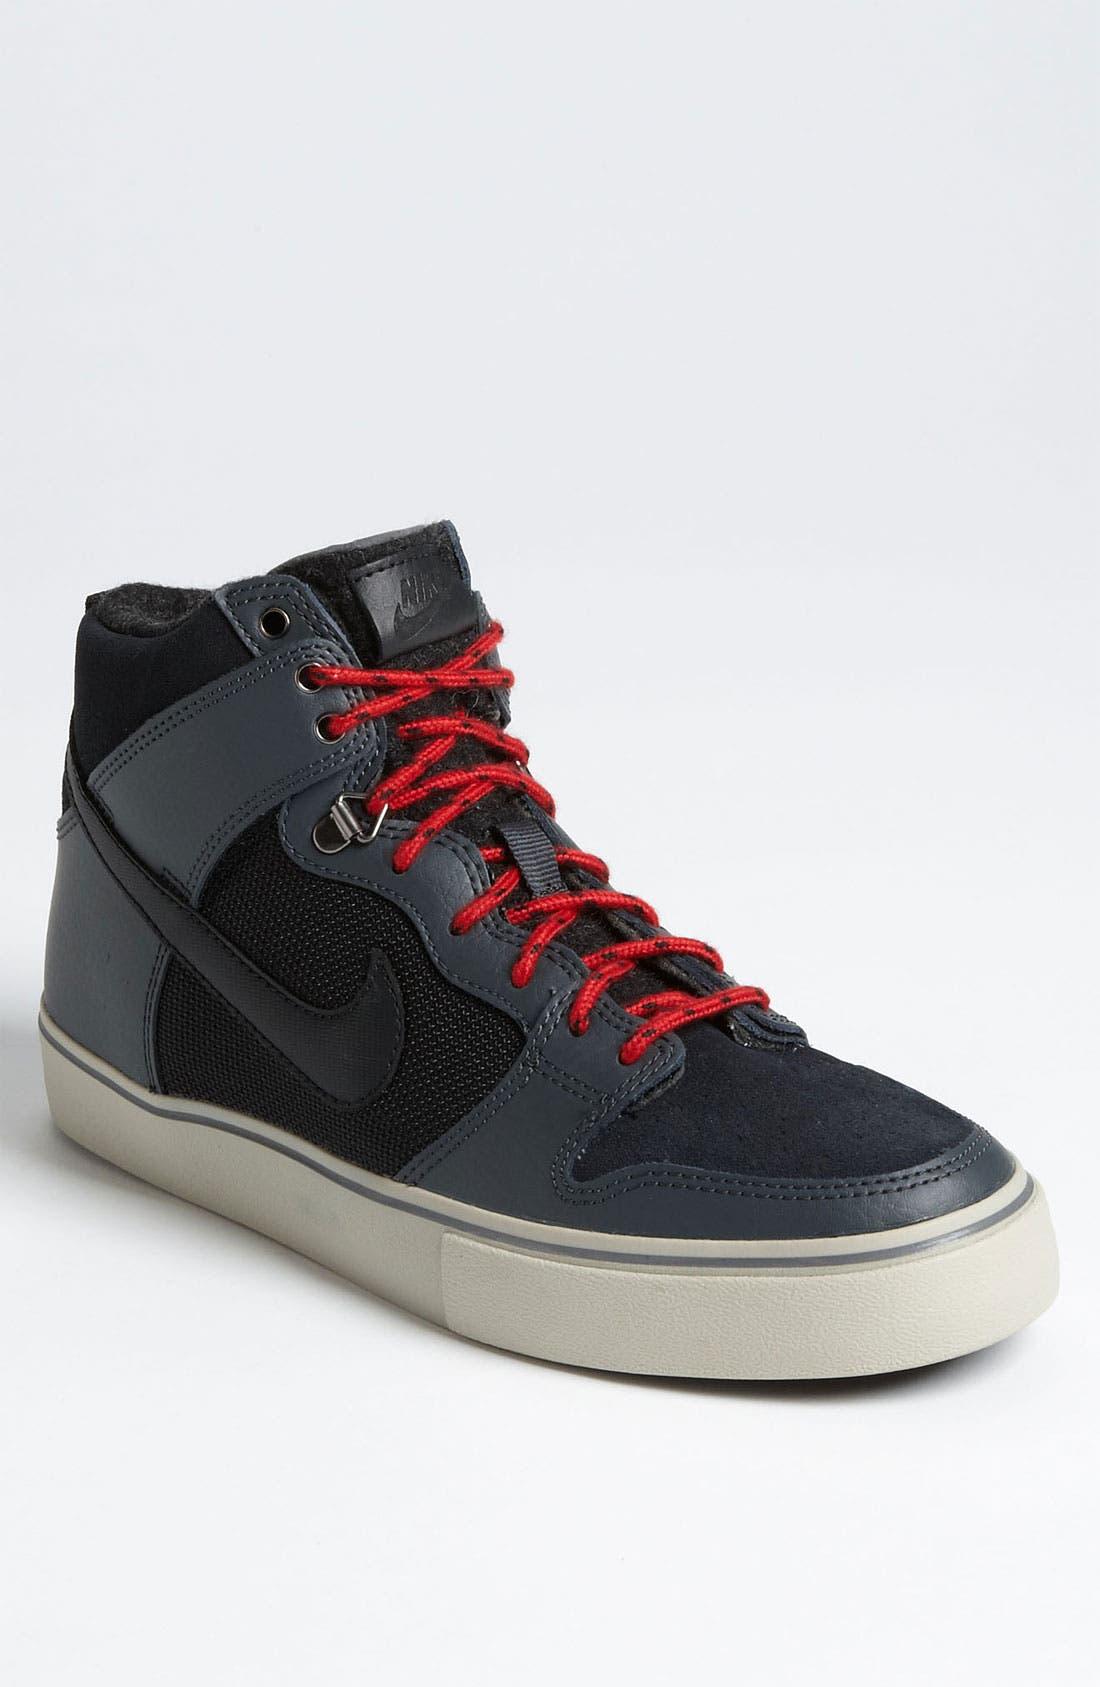 Main Image - Nike 'Dunk High LR' Sneaker (Men) (Online Only)